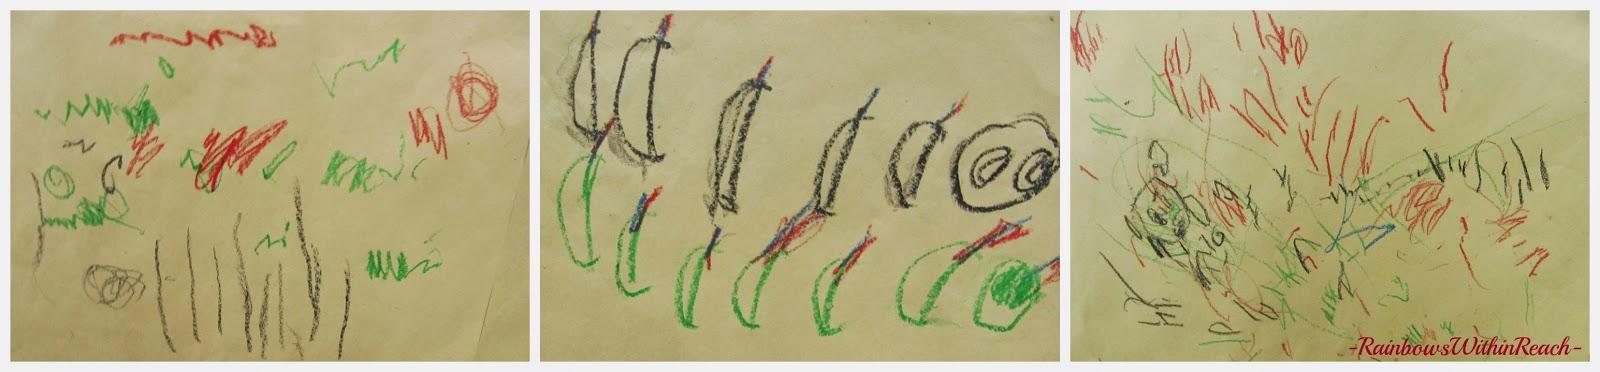 AUTHENTIC Children's Art: Response to Eric Carle via RainbowsWithinReach